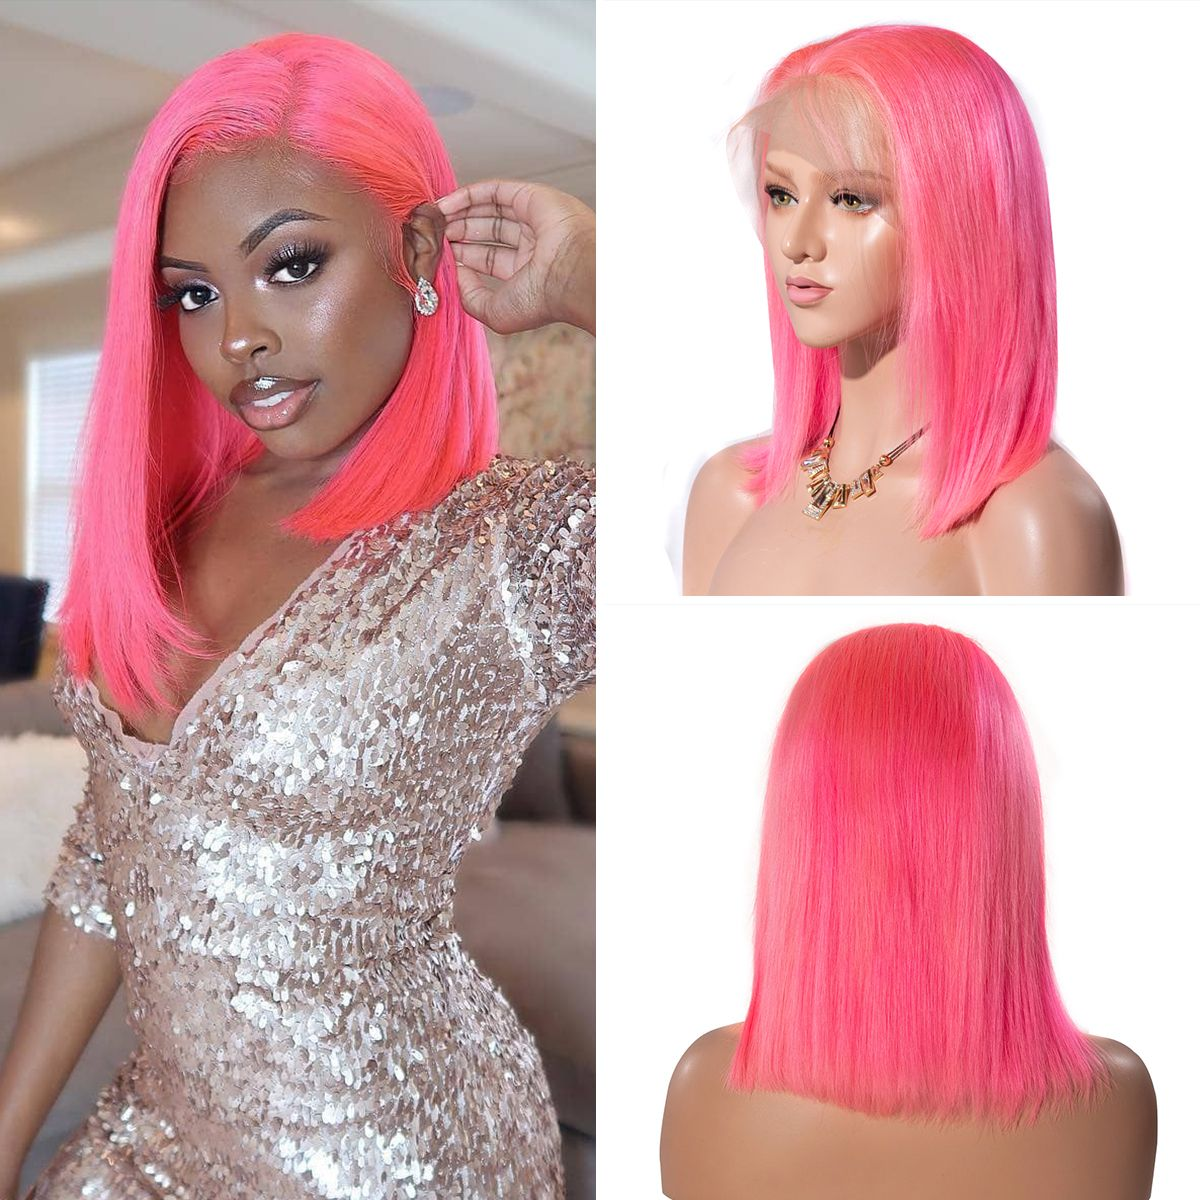 Colorful 13x6 Short Bob Straight Hair - Pink